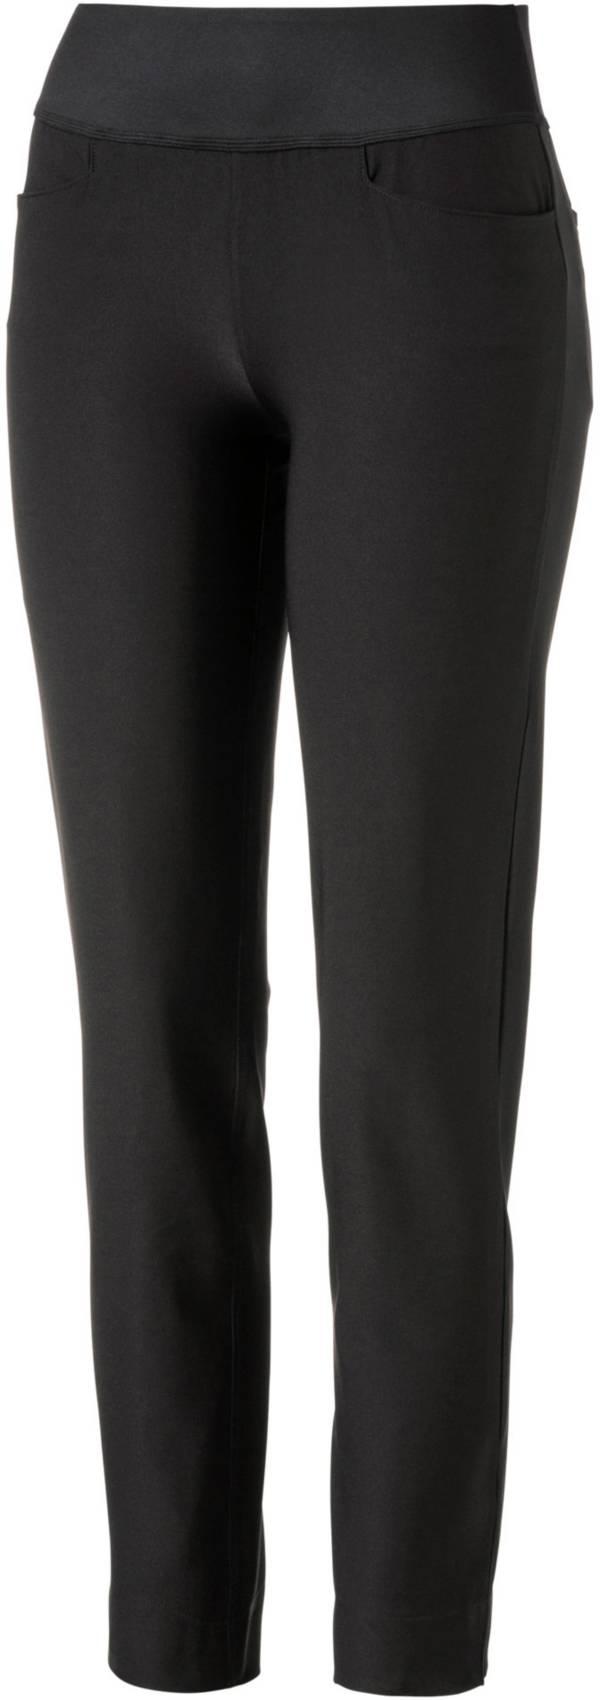 PUMA Women's PWRSHAPE Pull On Pants product image